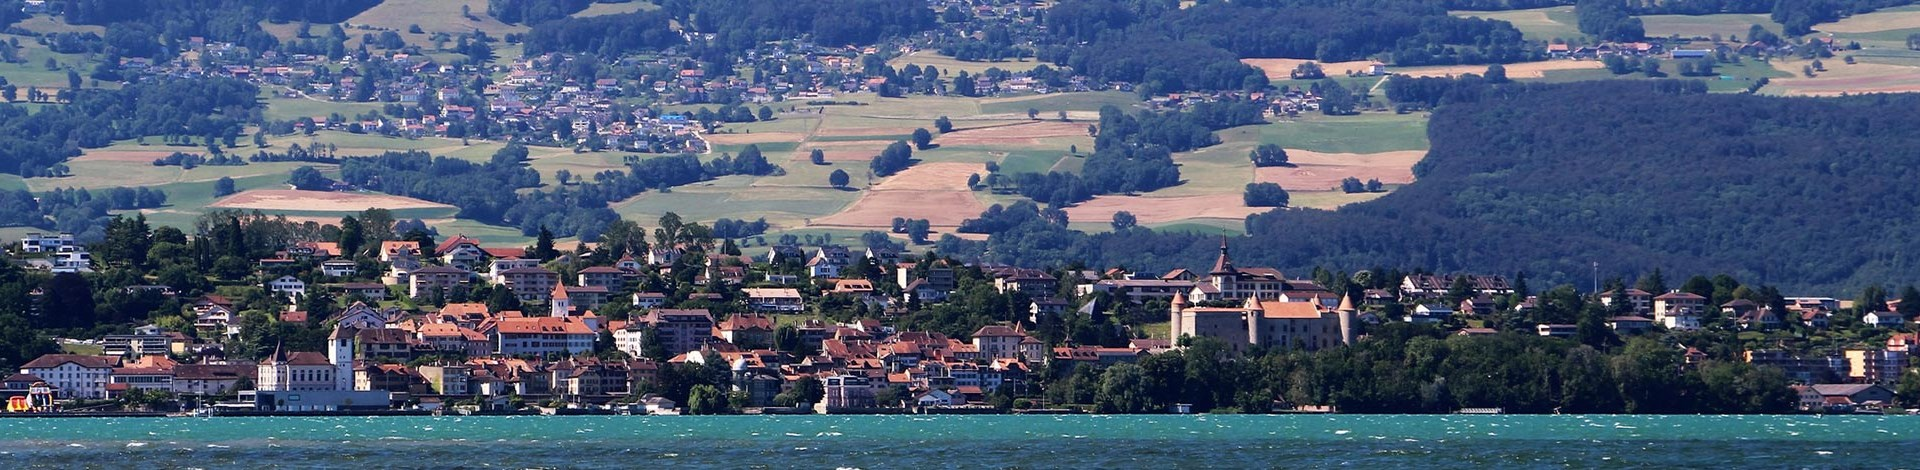 Yverdon-les-Bains